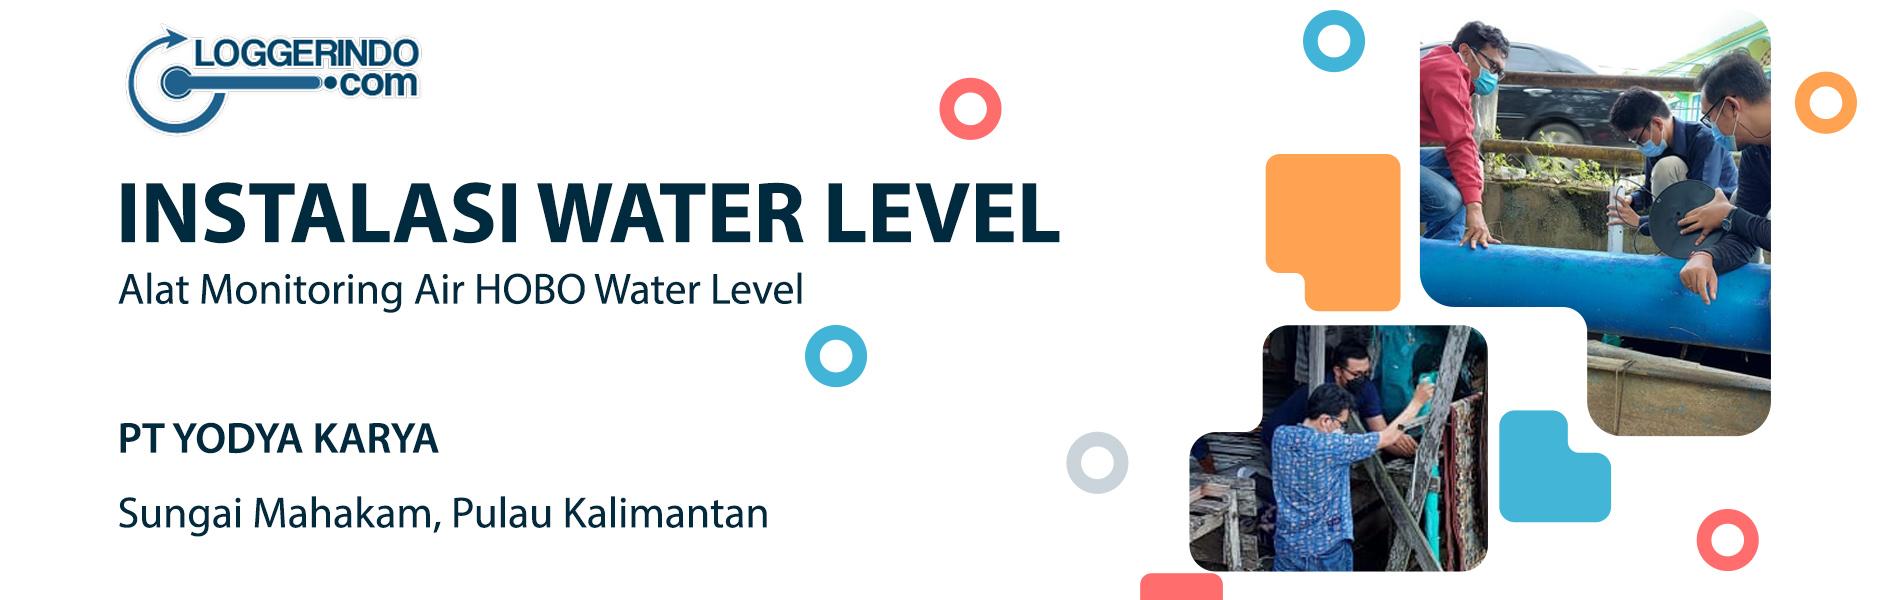 Instalasi Water Level Sungai Mahakam